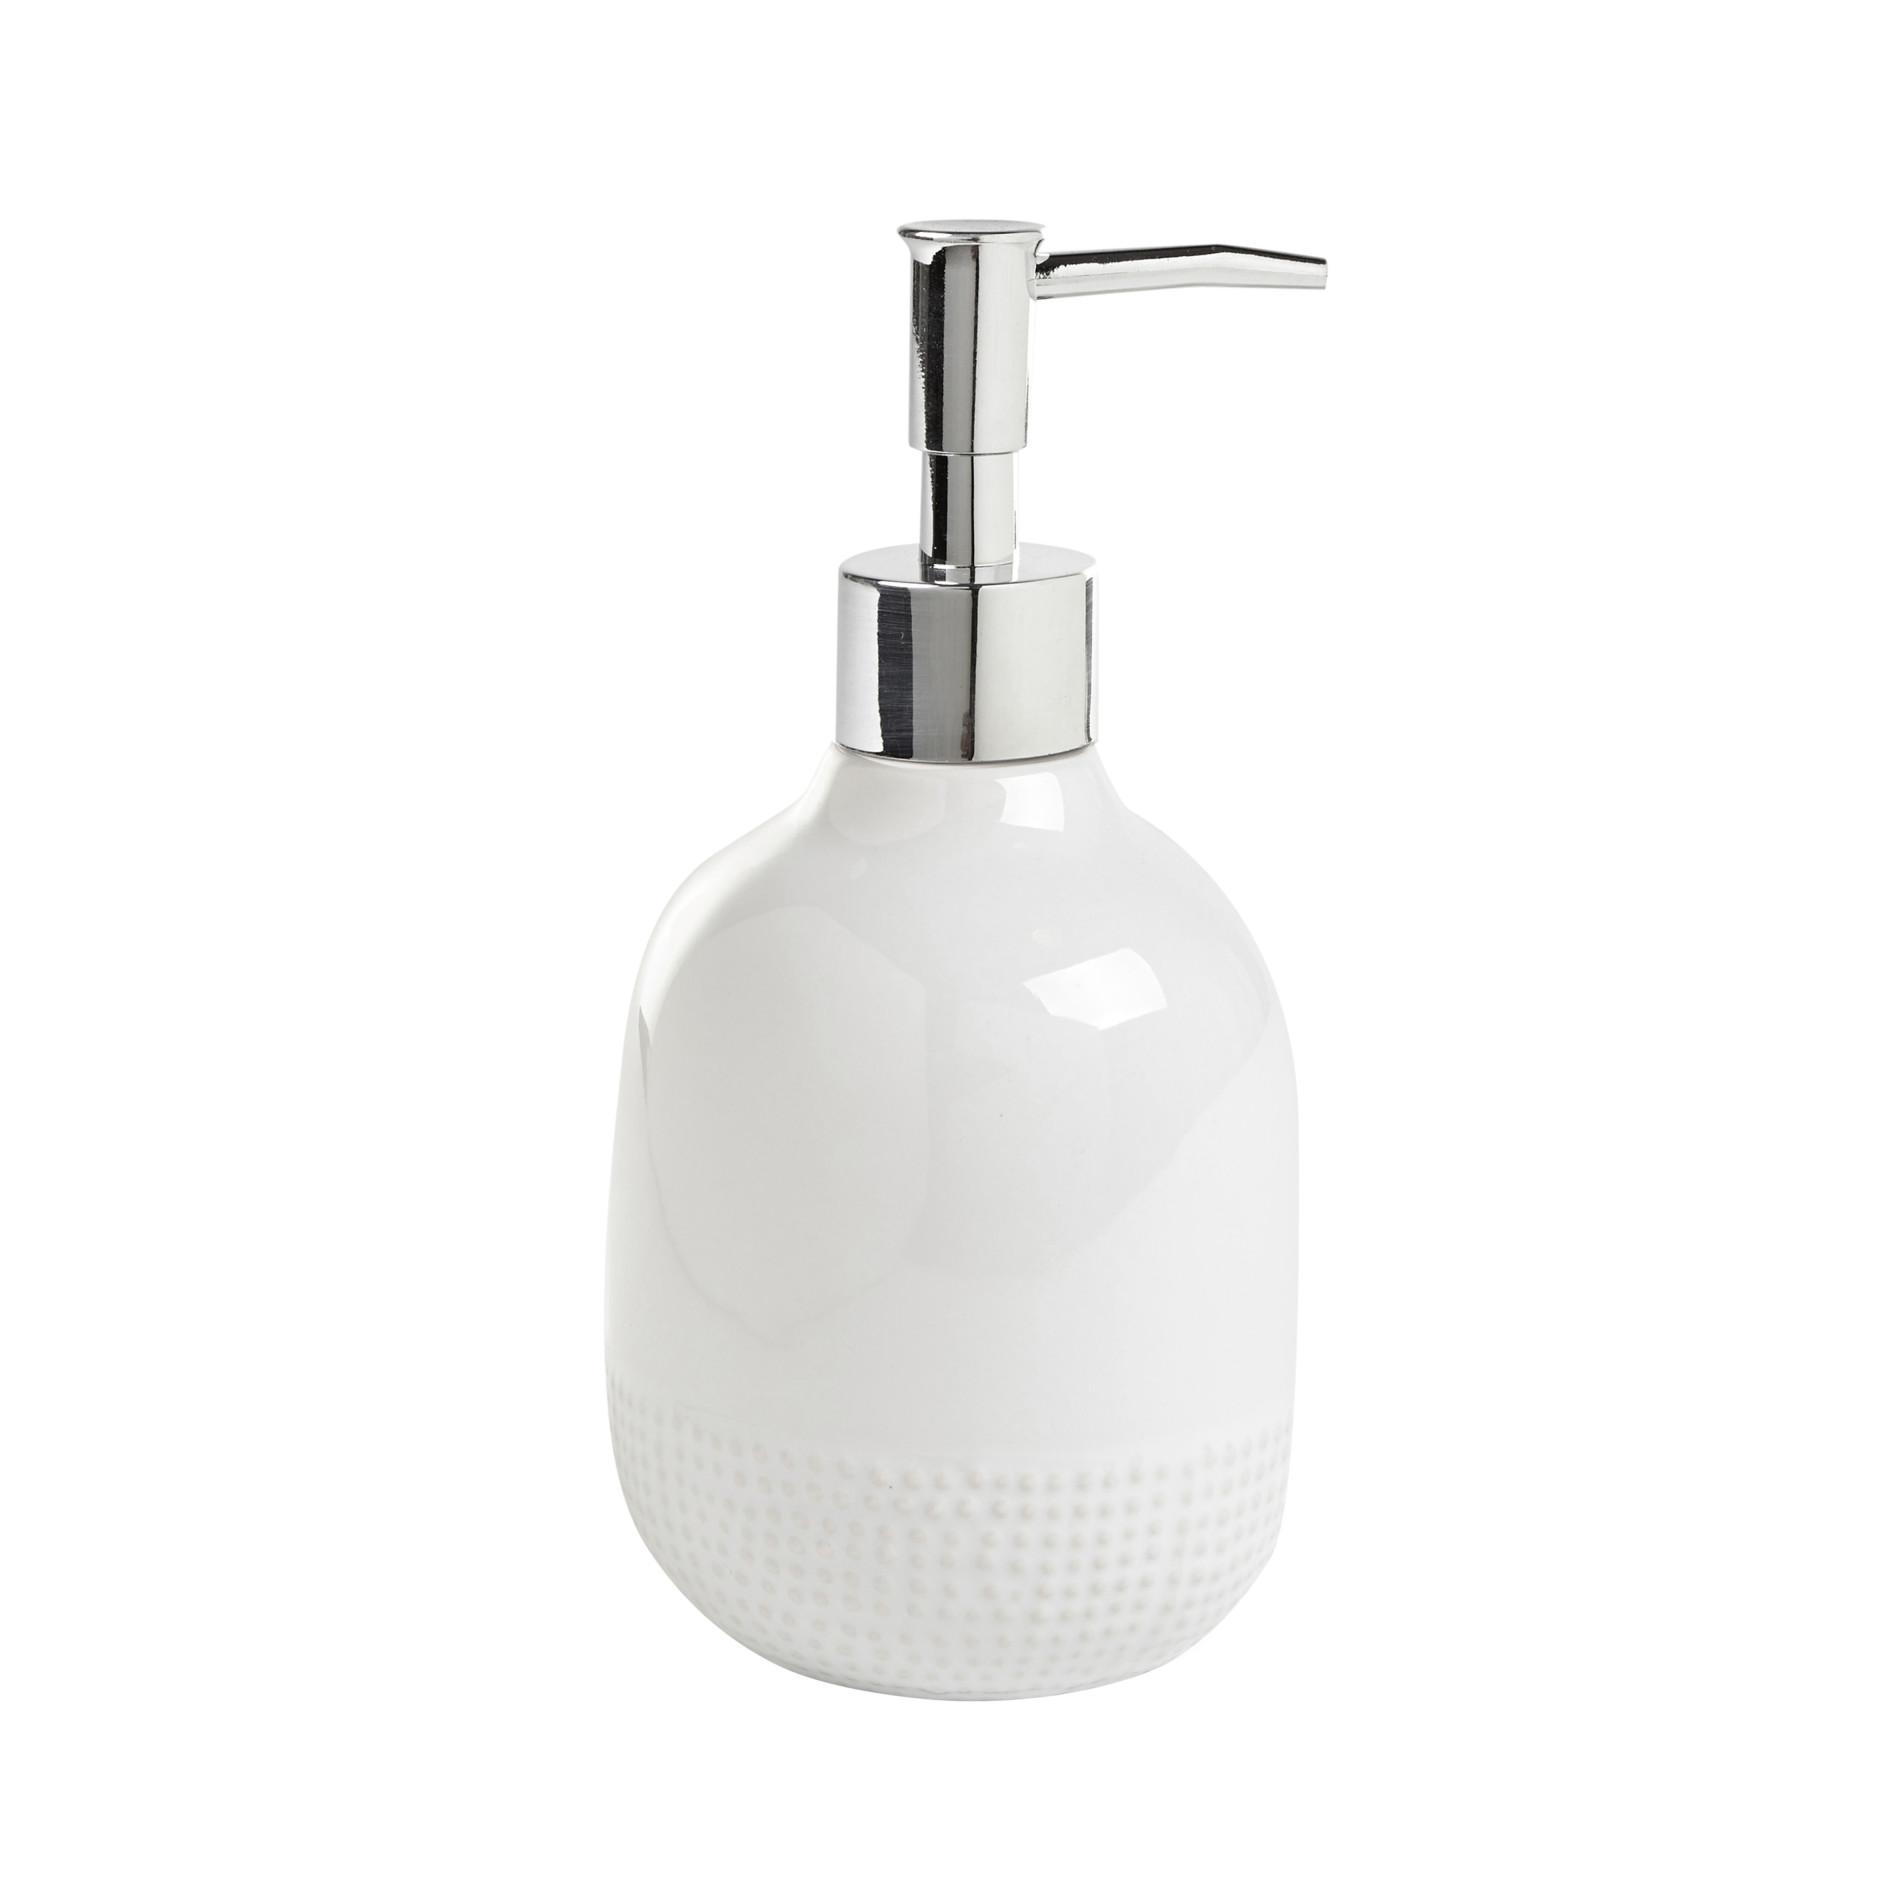 Dispenser sapone ceramica Dots - coincasa